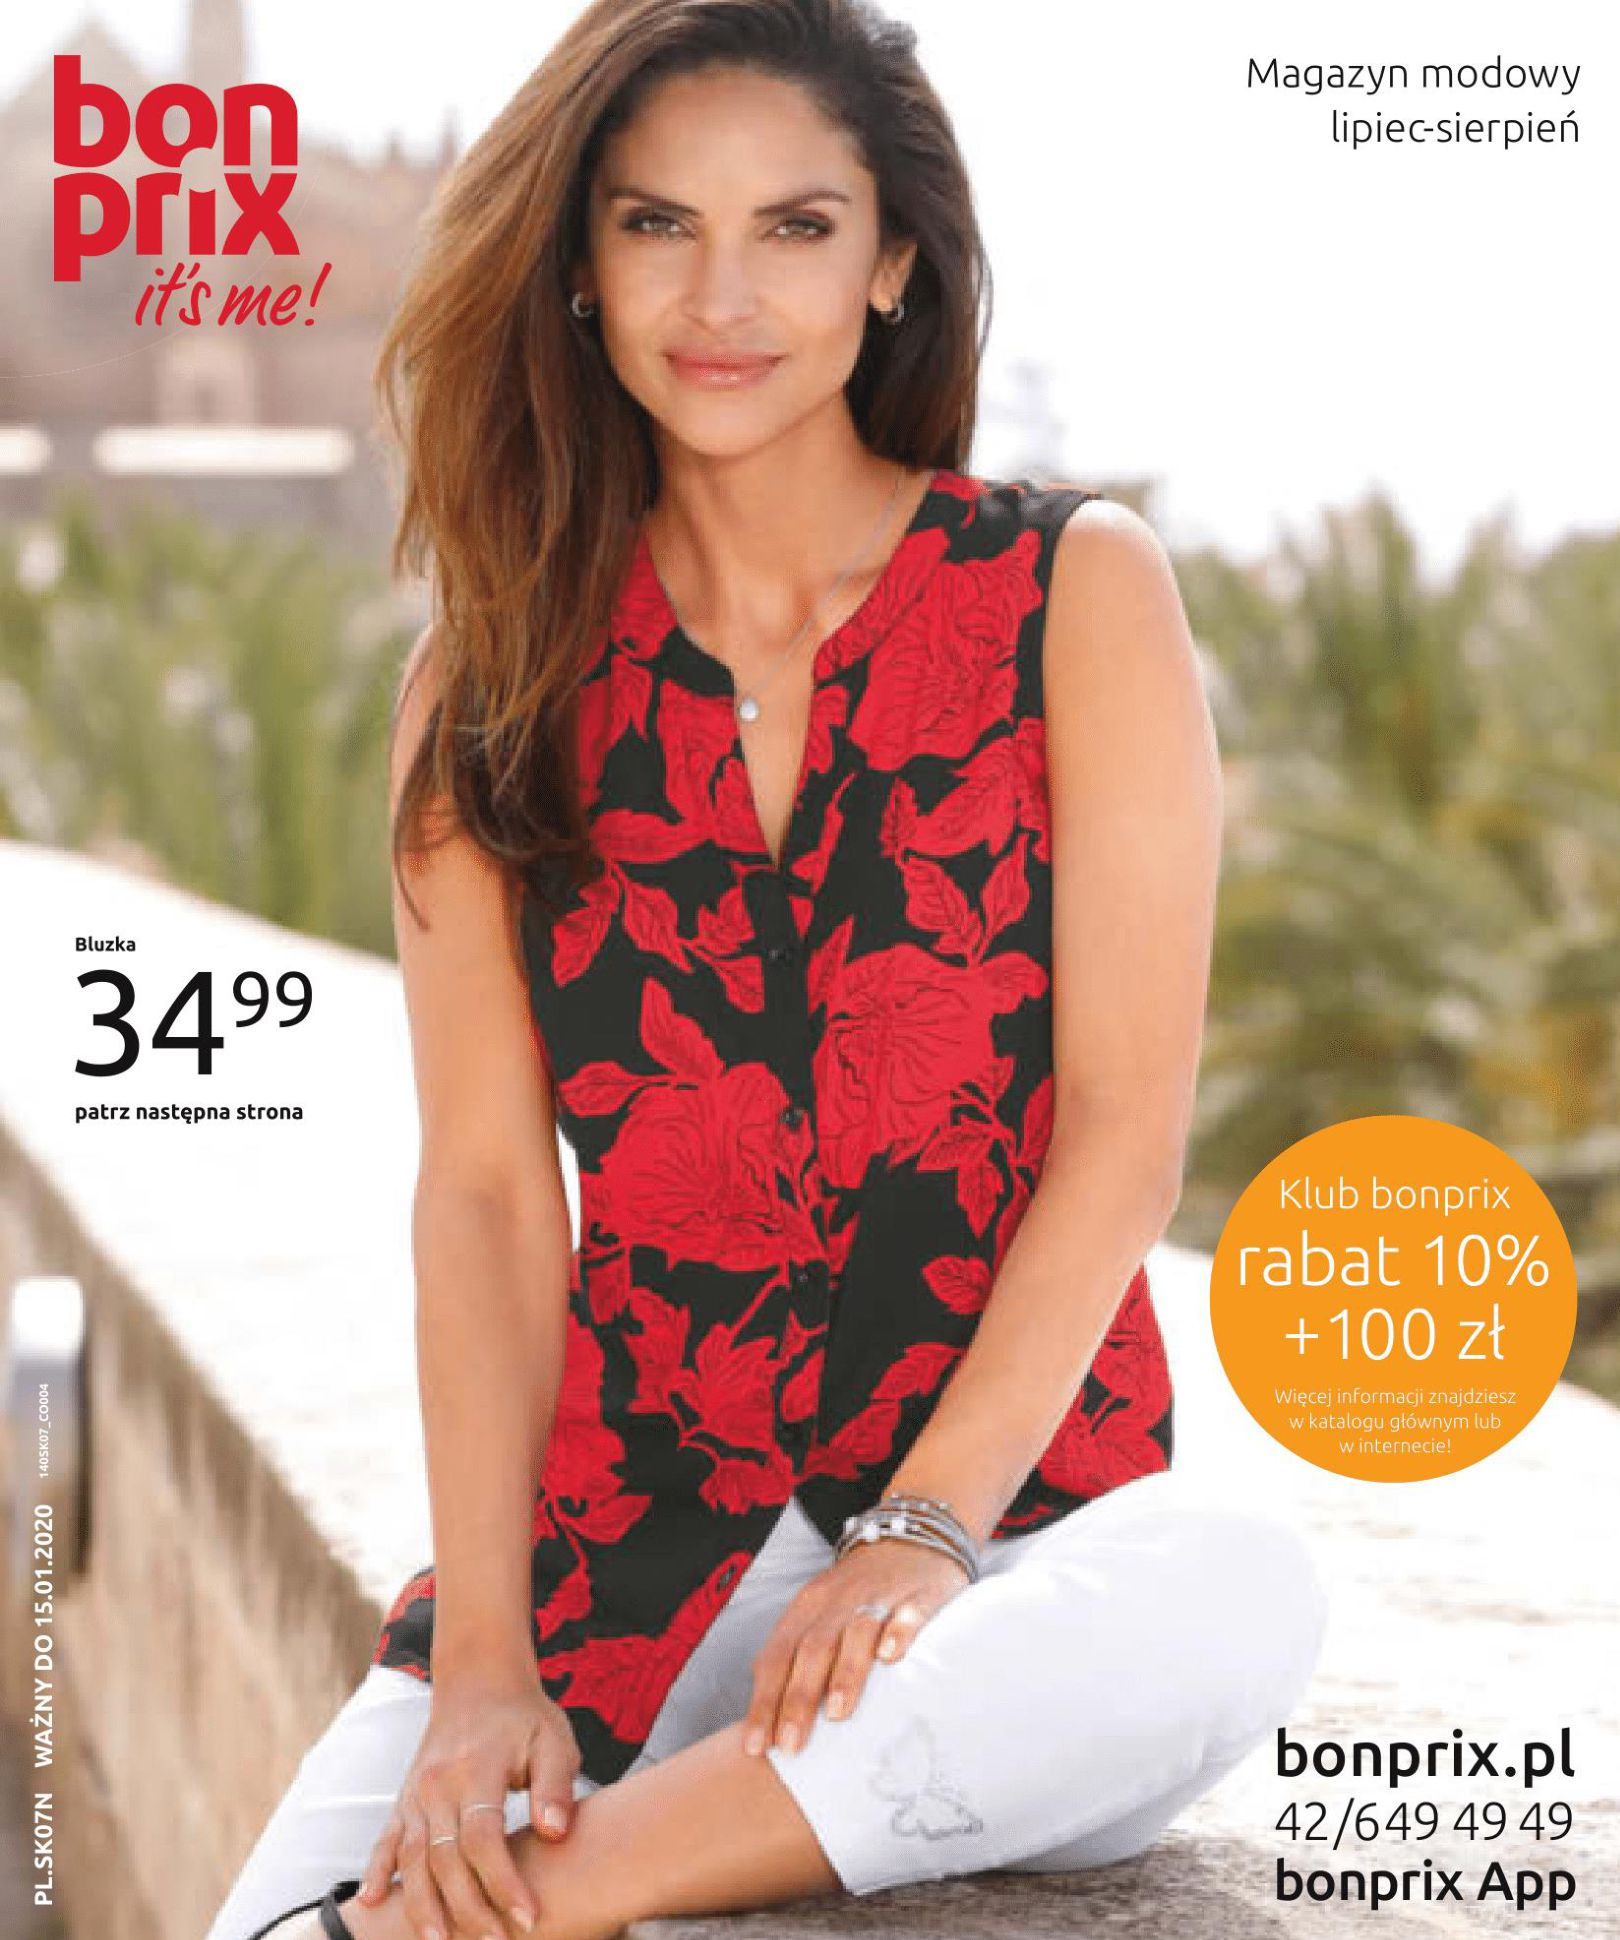 Gazetka Bonprix - Letnie trendy-02.07.2019-15.01.2020-page-1